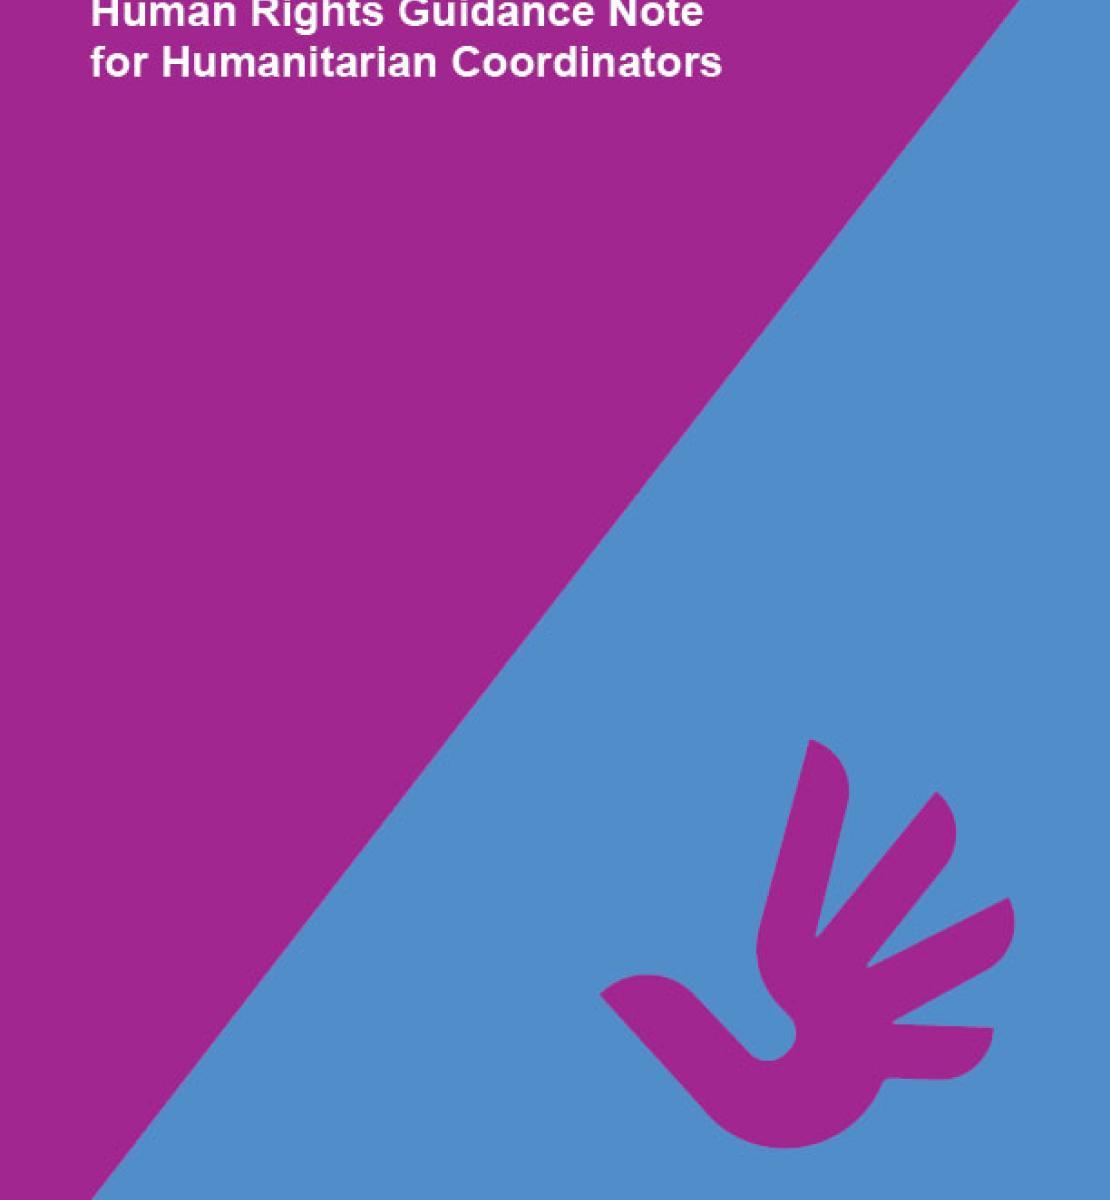 Human Rights Guidance Note for Humanitarian Coordinators